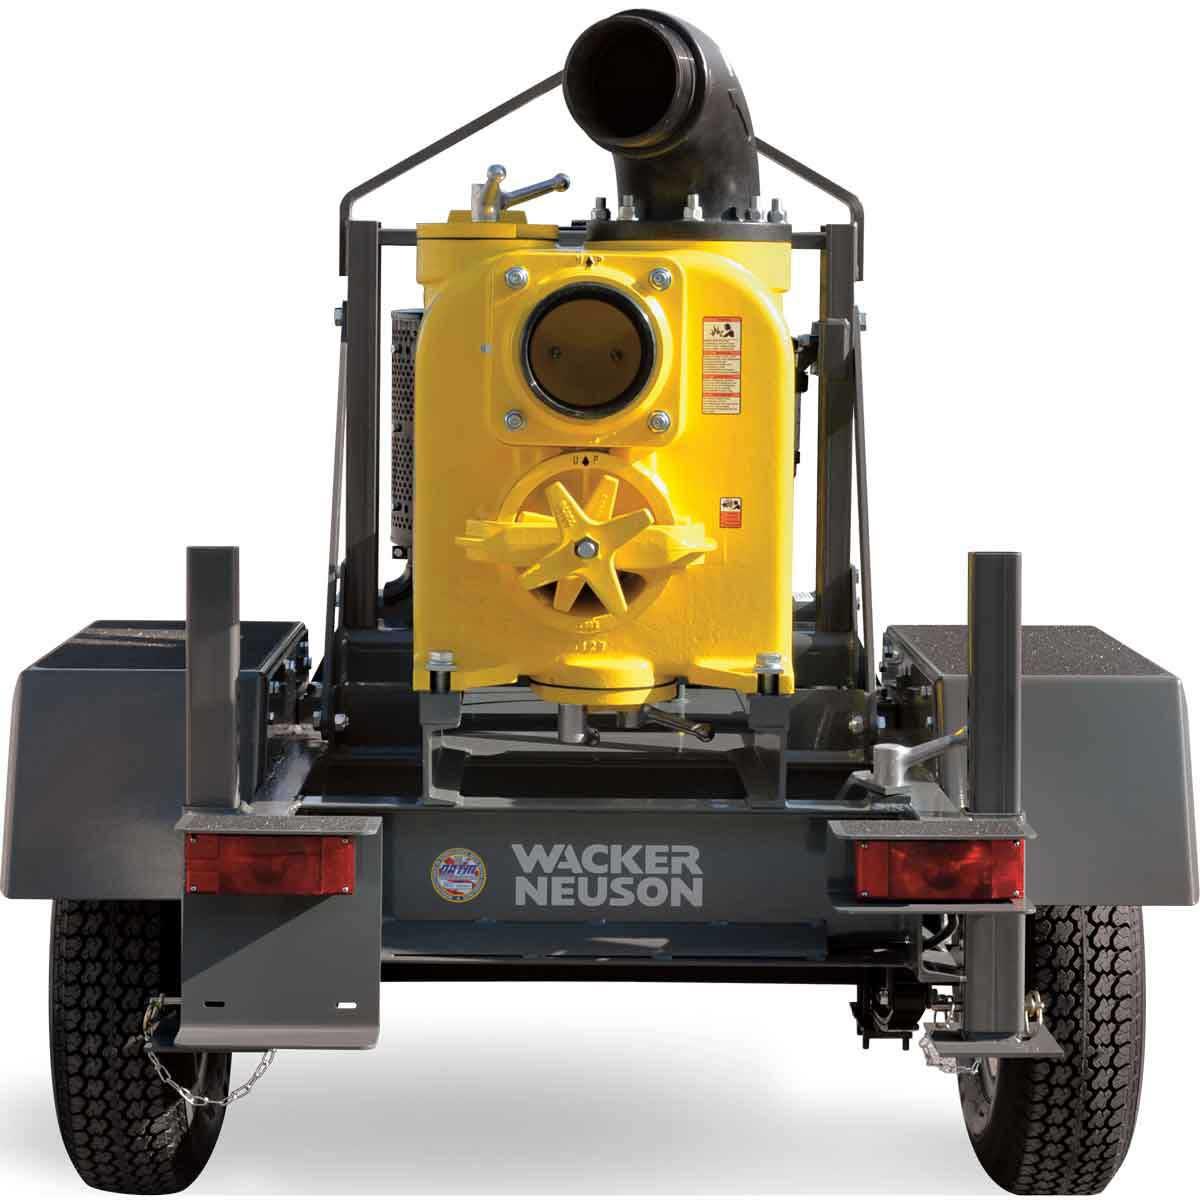 5200017430 Wacker Neuson PTS Pump with 2 inch Ball